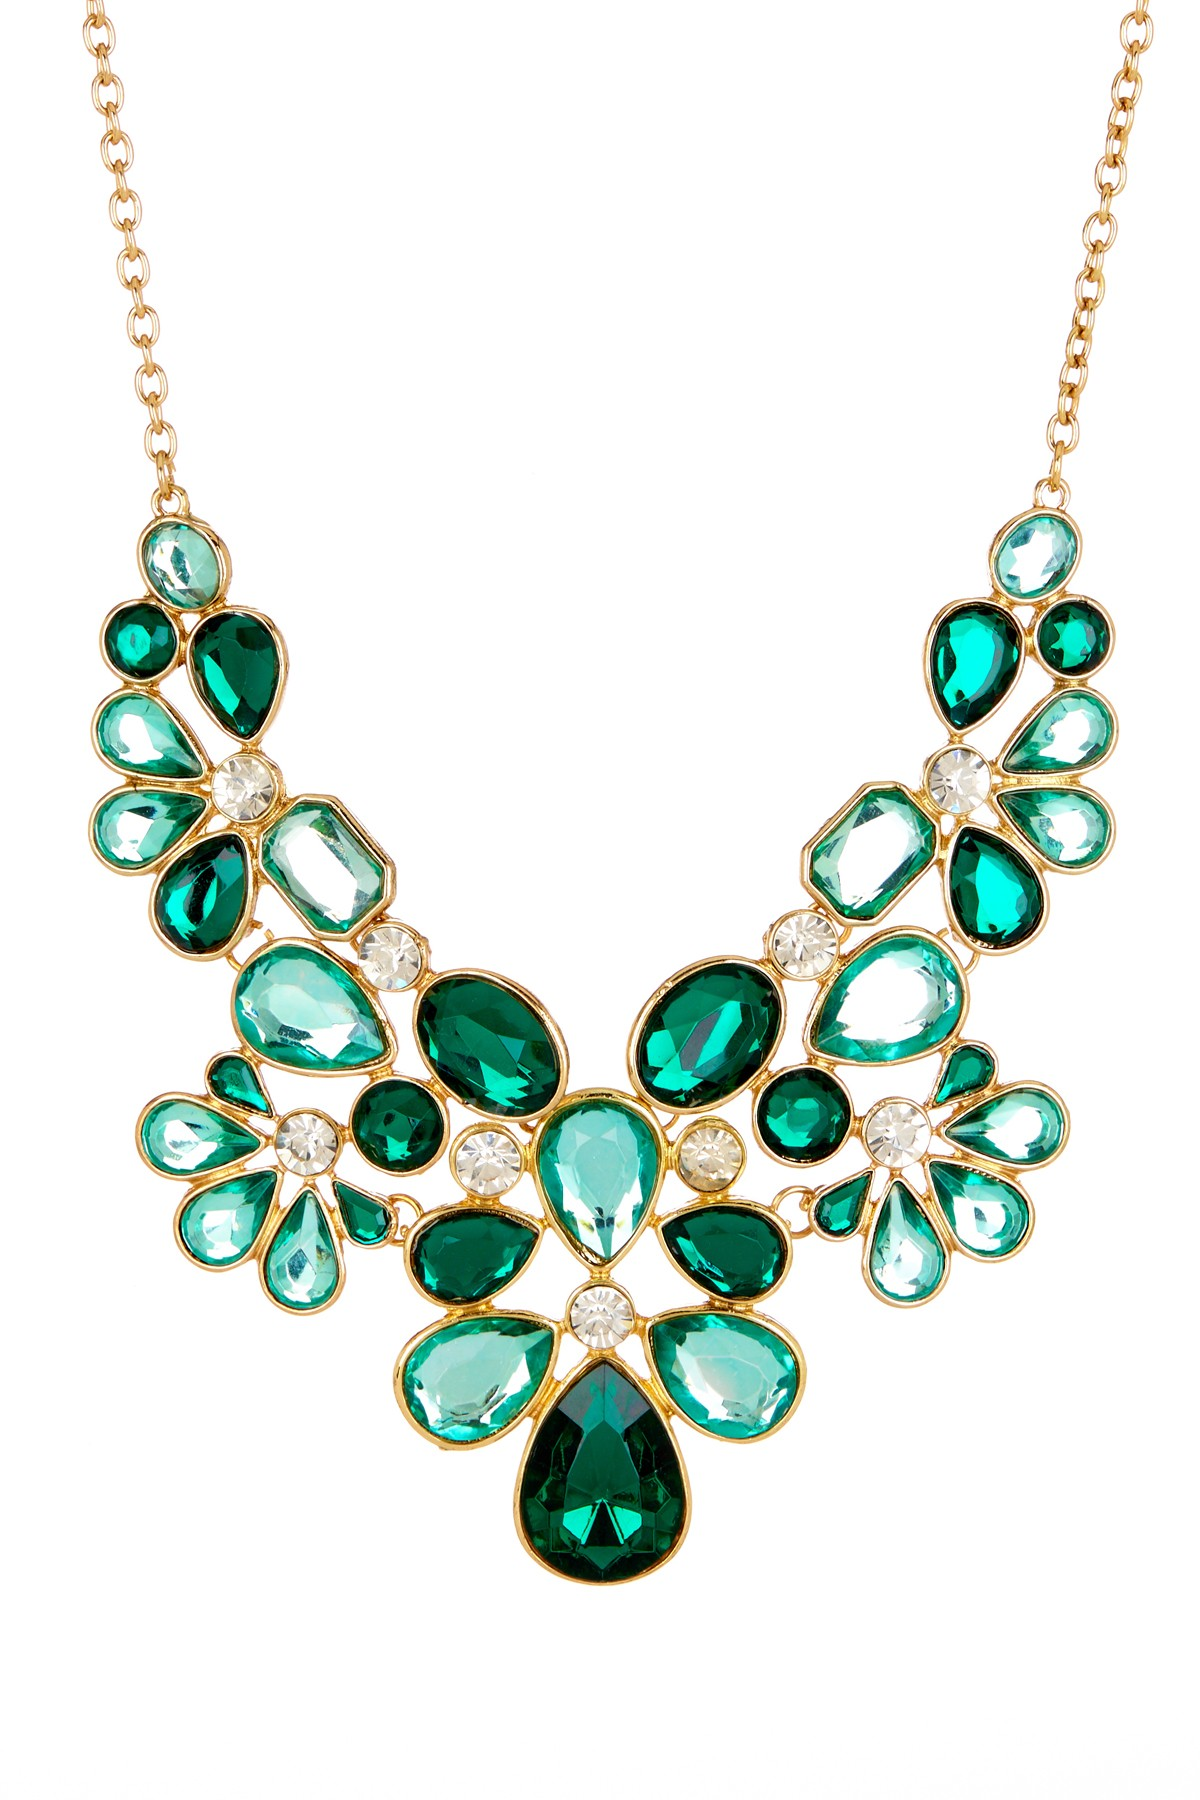 Vishnu Emerald Mix Stone Crystal Glam Statement Bib Necklace - photo#1